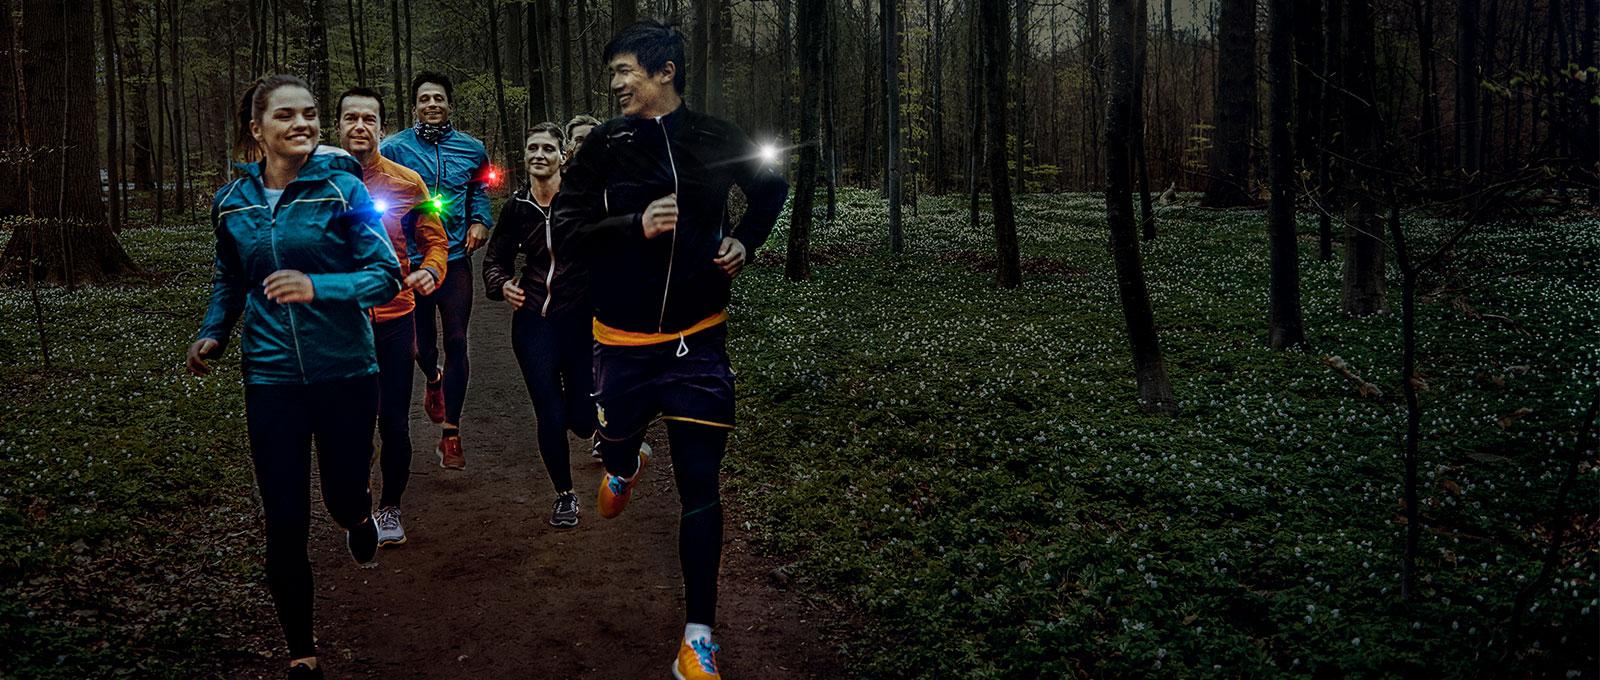 Orbiloc Run Dual Safety Light - Group Run